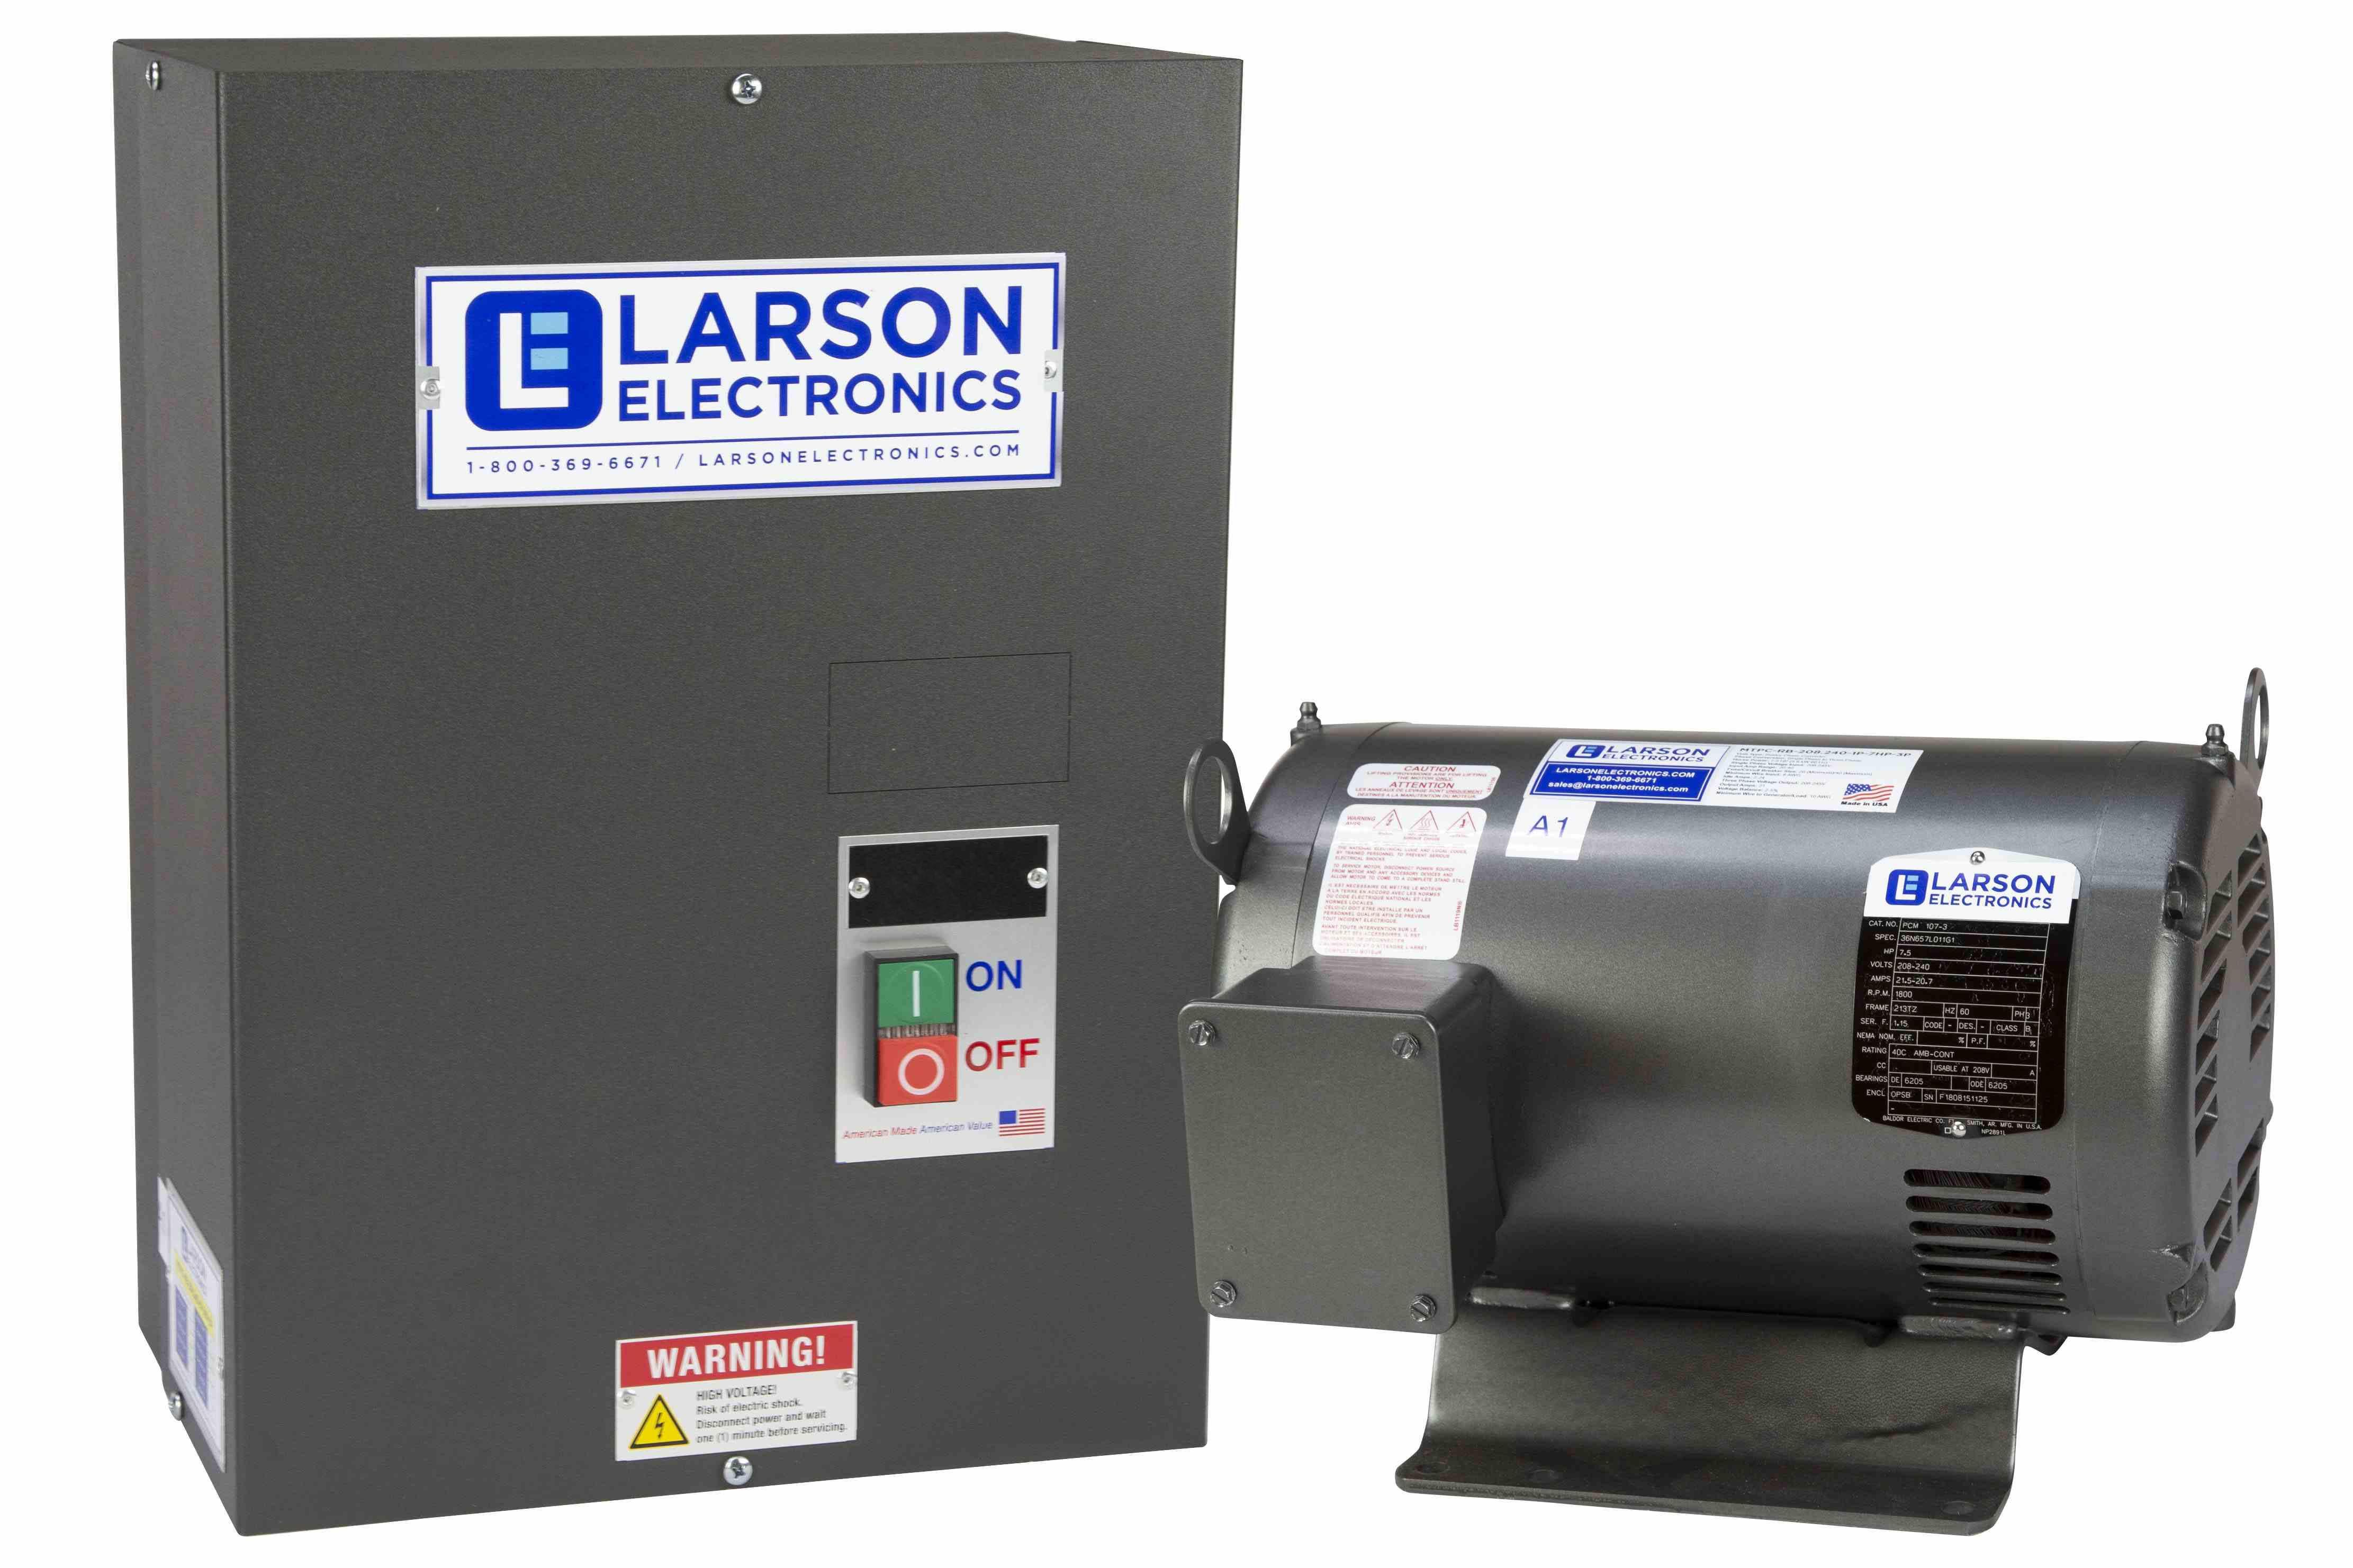 Rotary Phase Converter for 100HP Medium Loads, 230V 1PH to 3PH, 273 Amps Output, 150HP Idler, NEMA 1